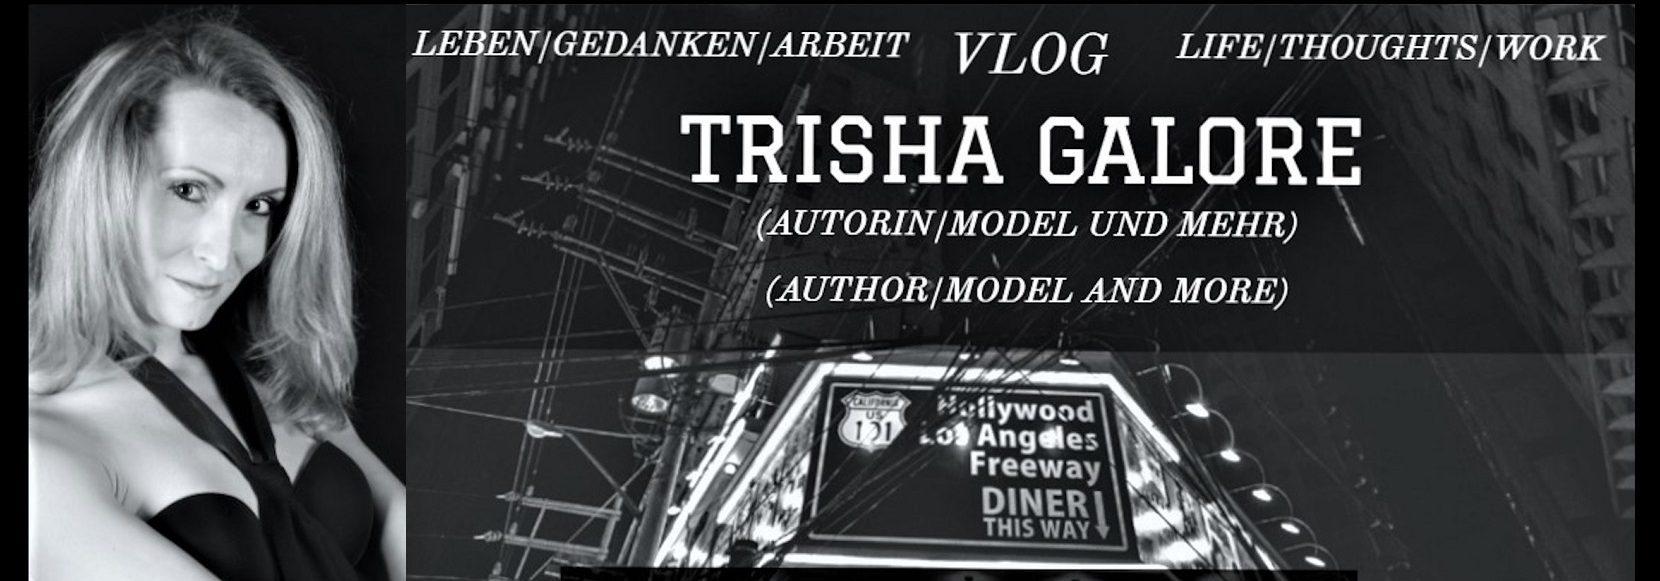 Offizielle Homepage der Autorin Trisha Galore (Patrizia Gruber)